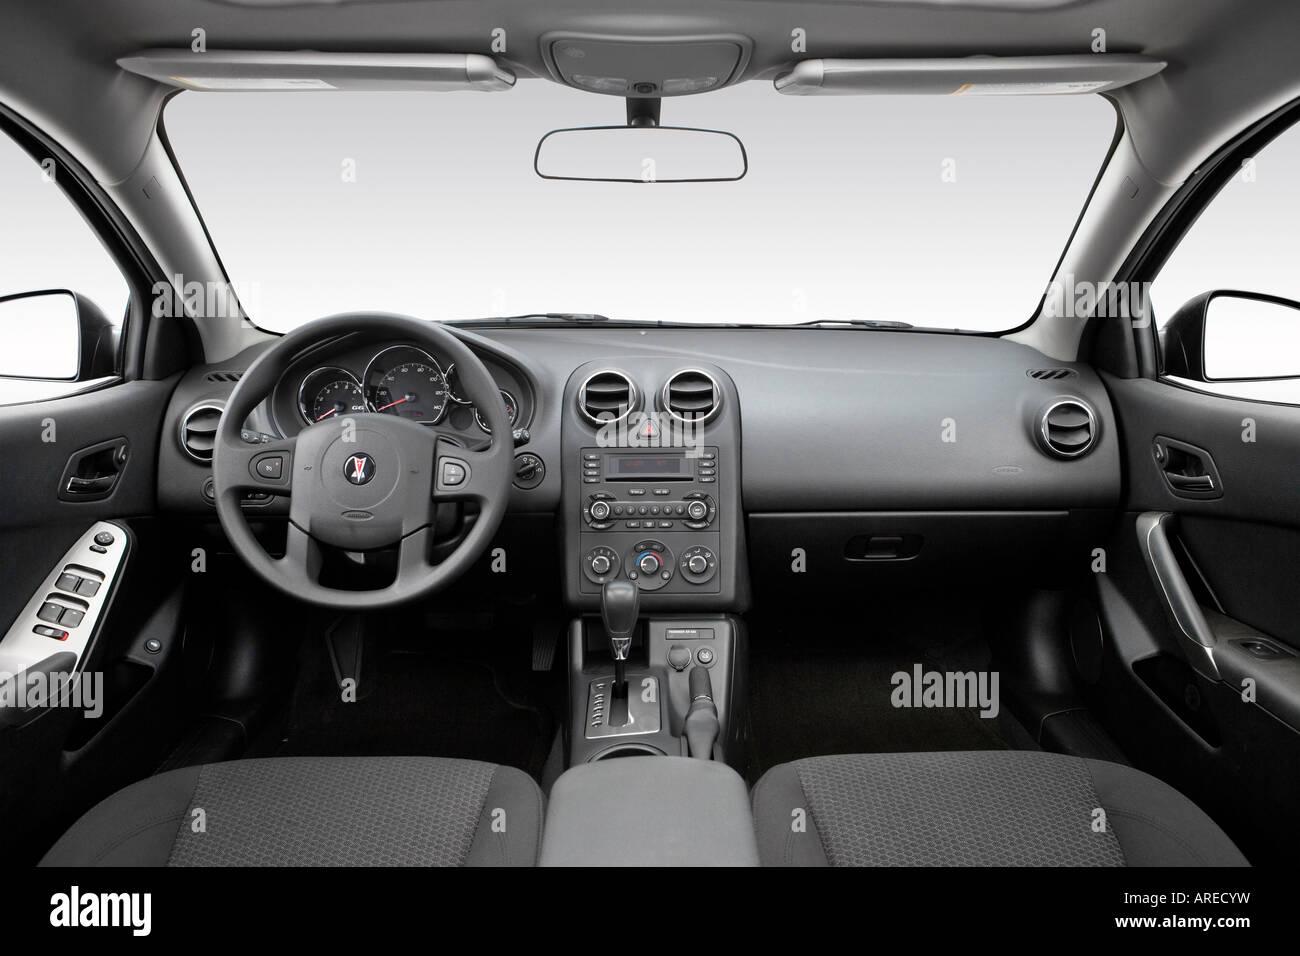 2006 pontiac g6 v6 in green dashboard center console gear shifter view